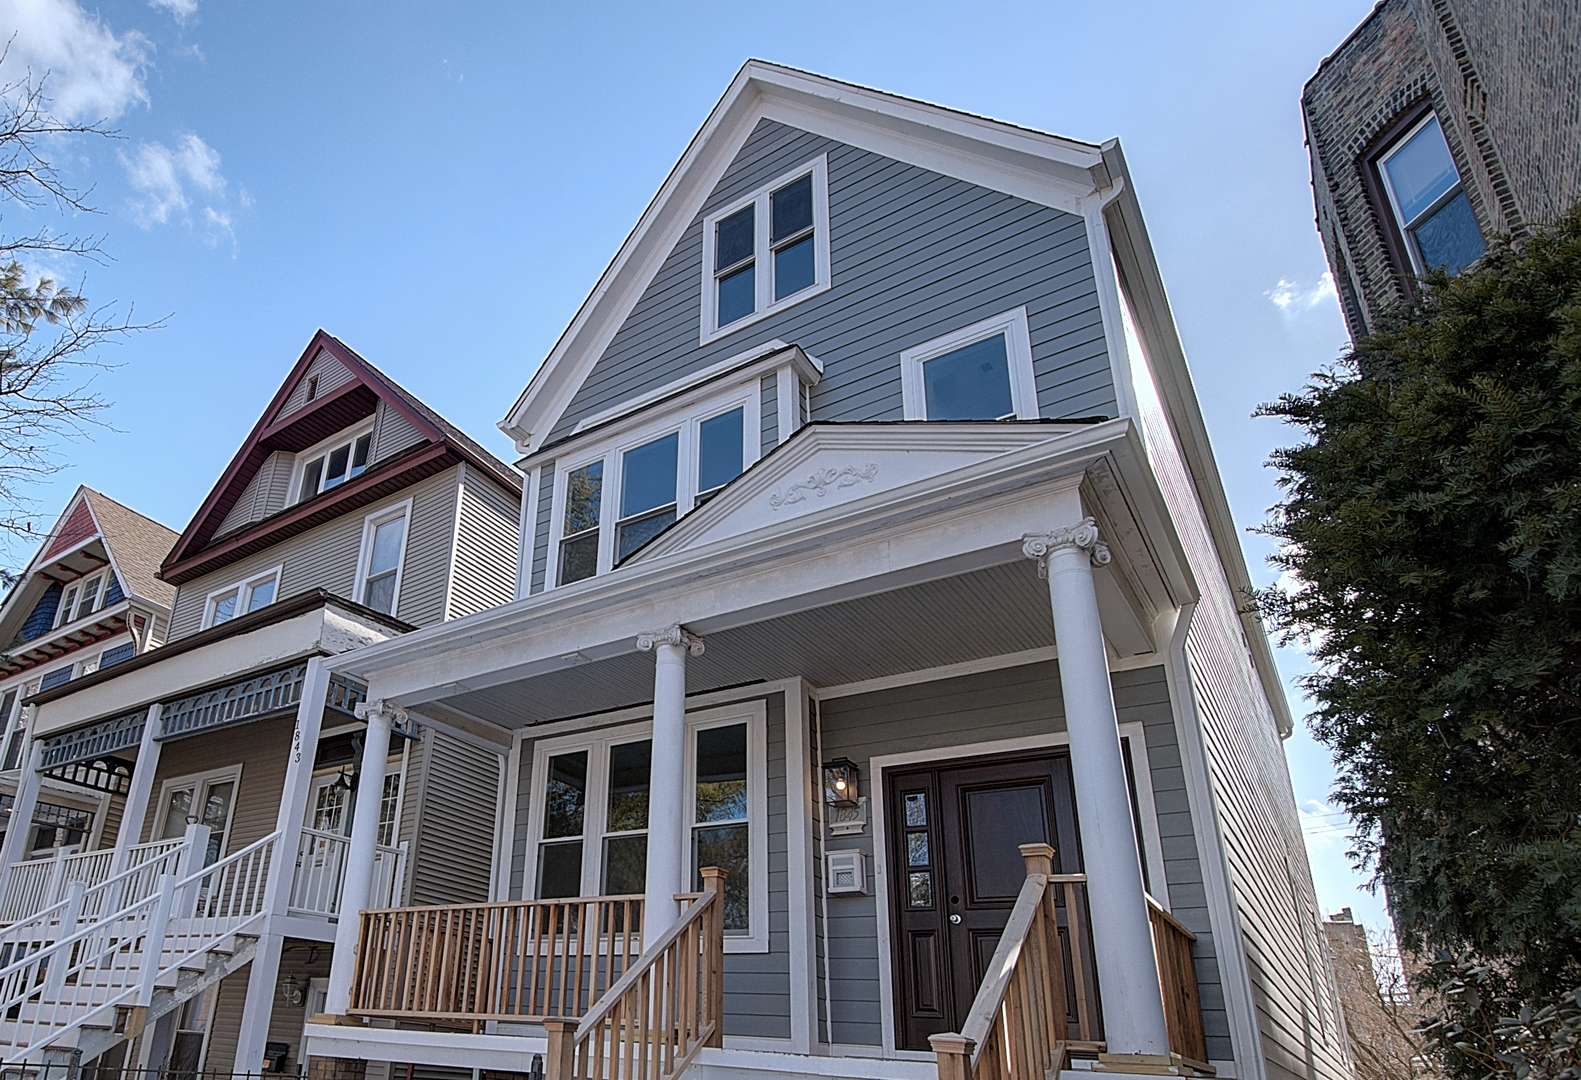 Homes for Sale Near COONLEY ELEMENTARY SCHOOL Elementray School